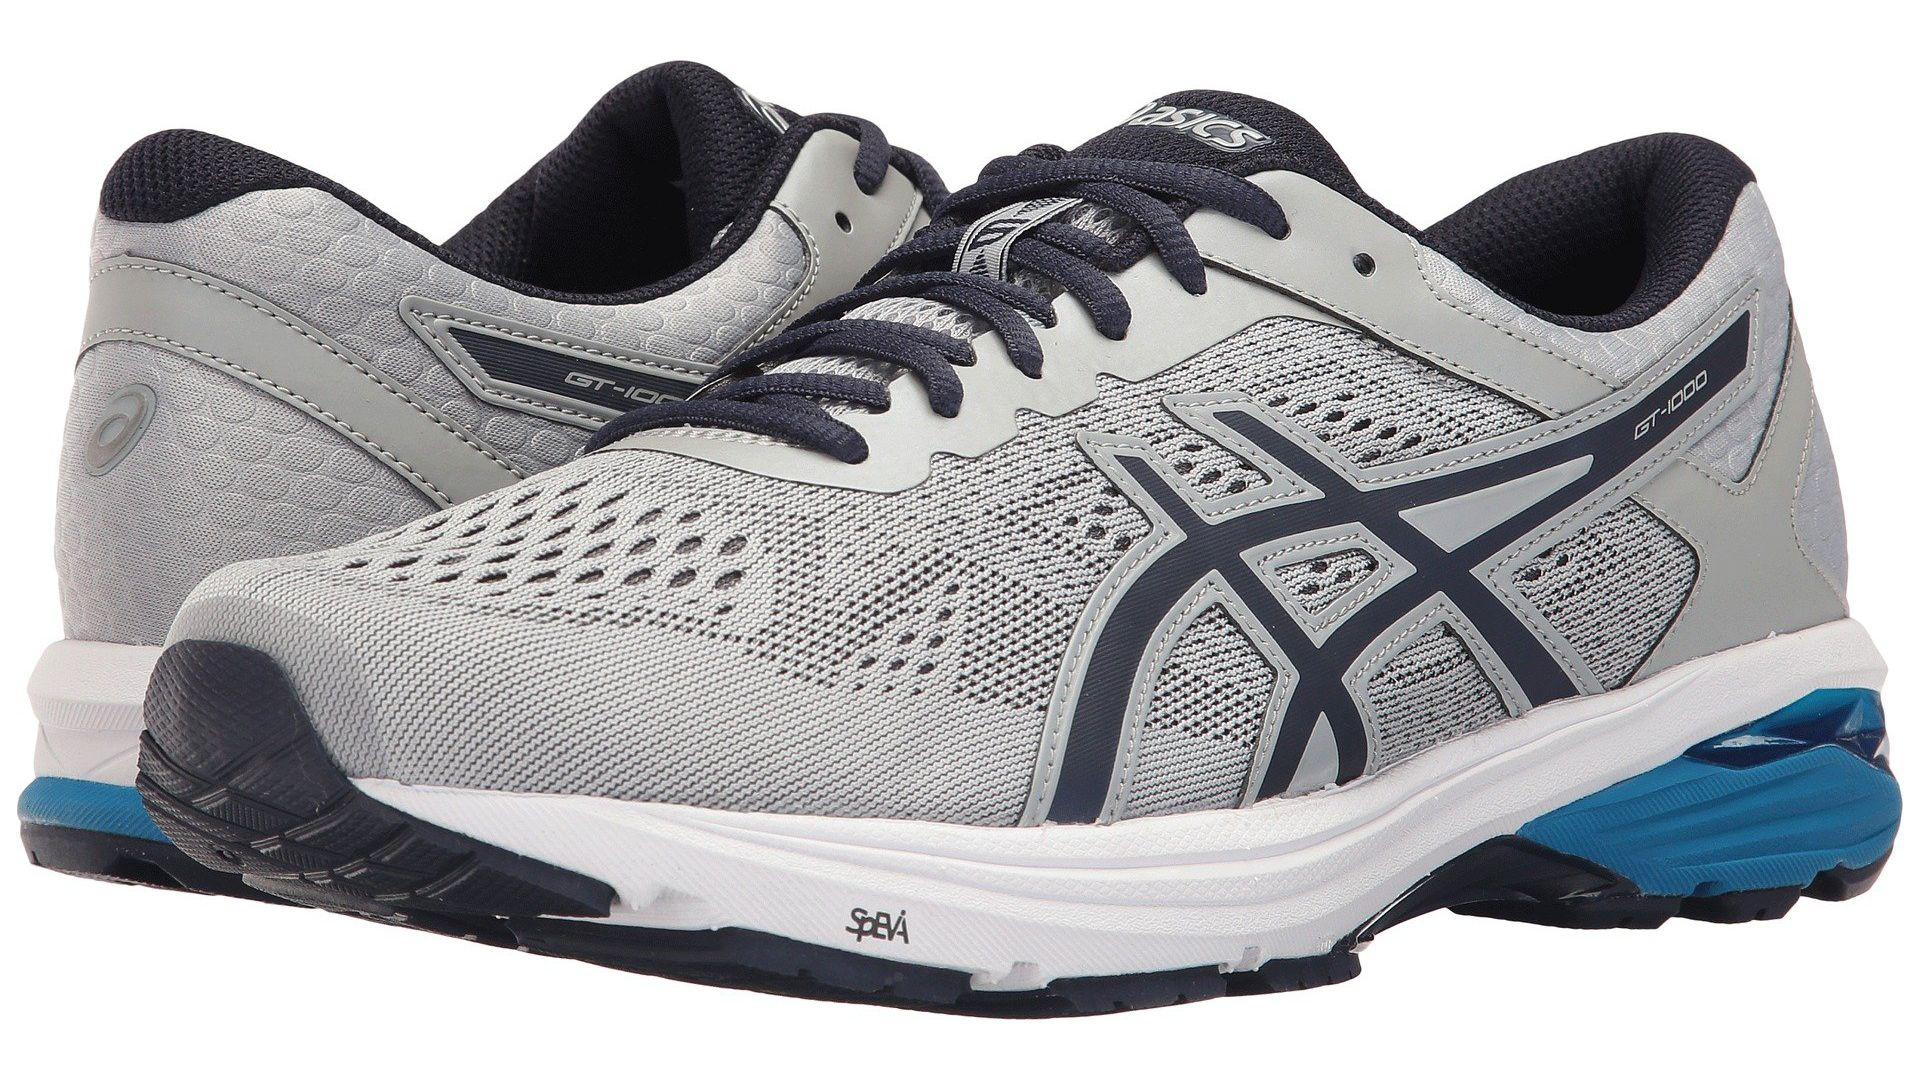 mens mizuno running shoes size 9.5 europe high trail price